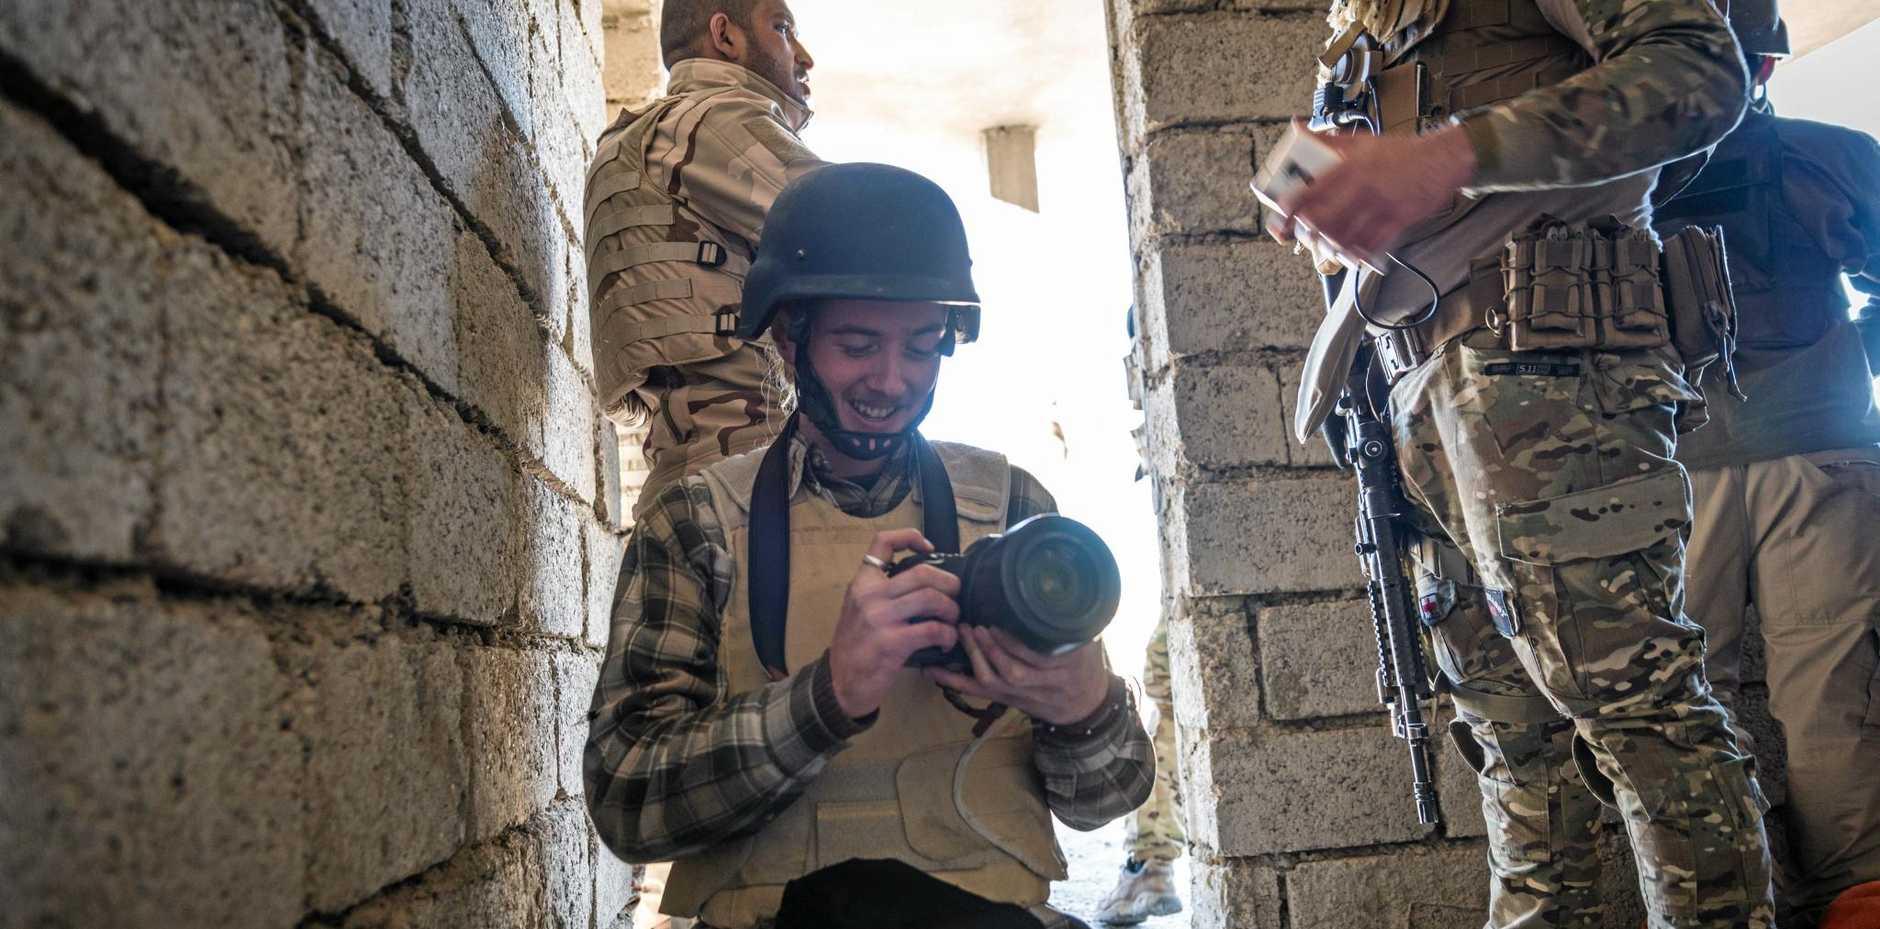 Josh McDonald in Iraq.